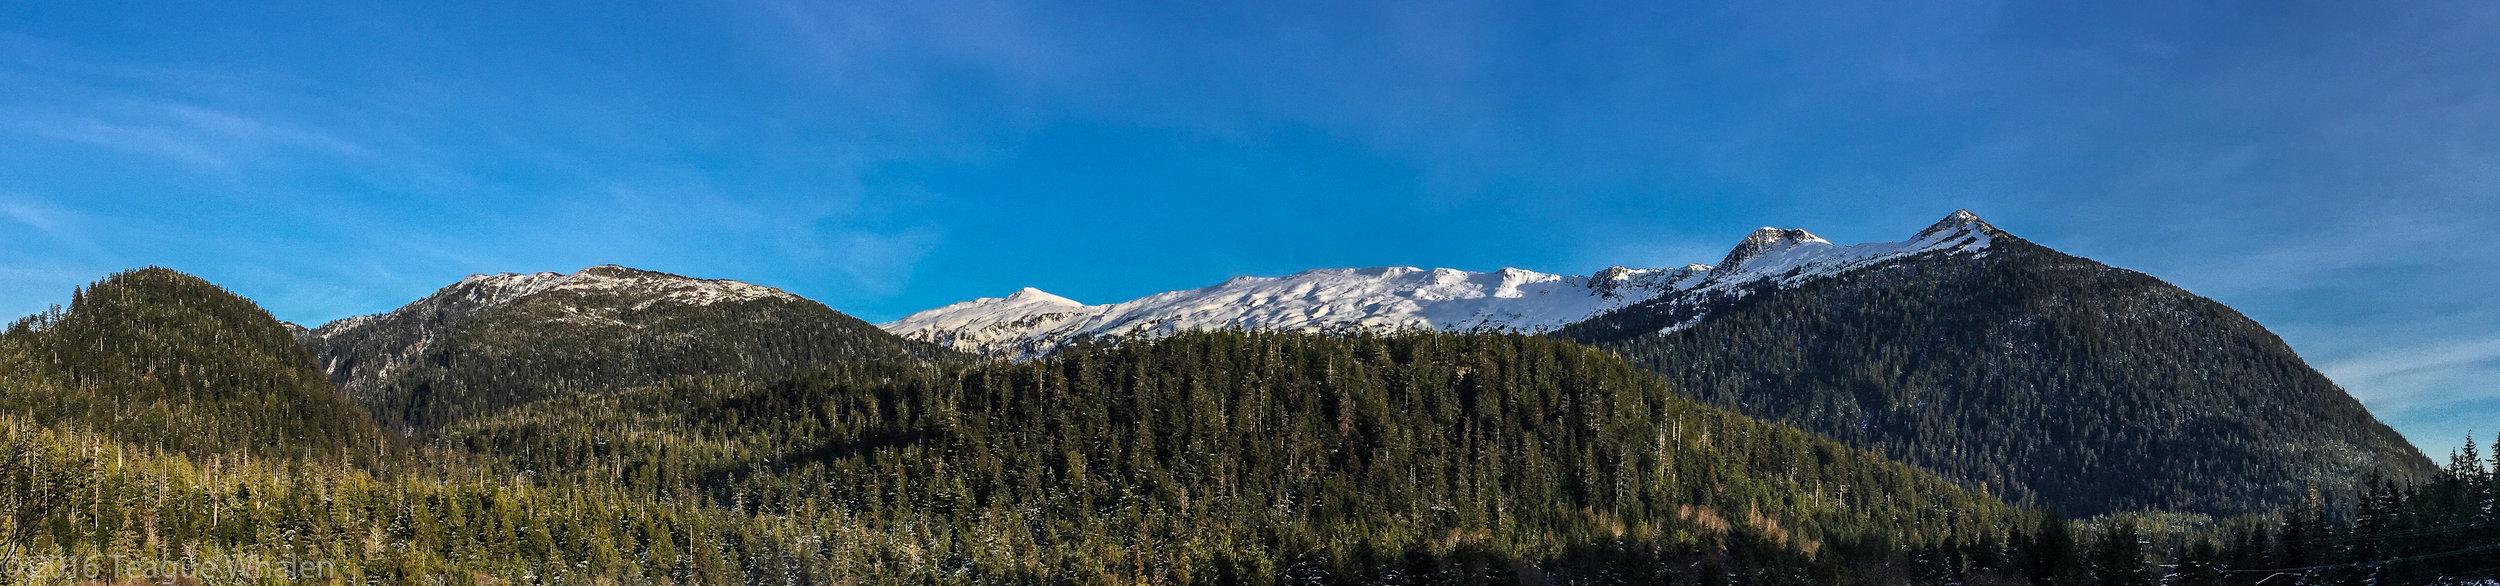 Deer Mt Ridge with Snow.jpg